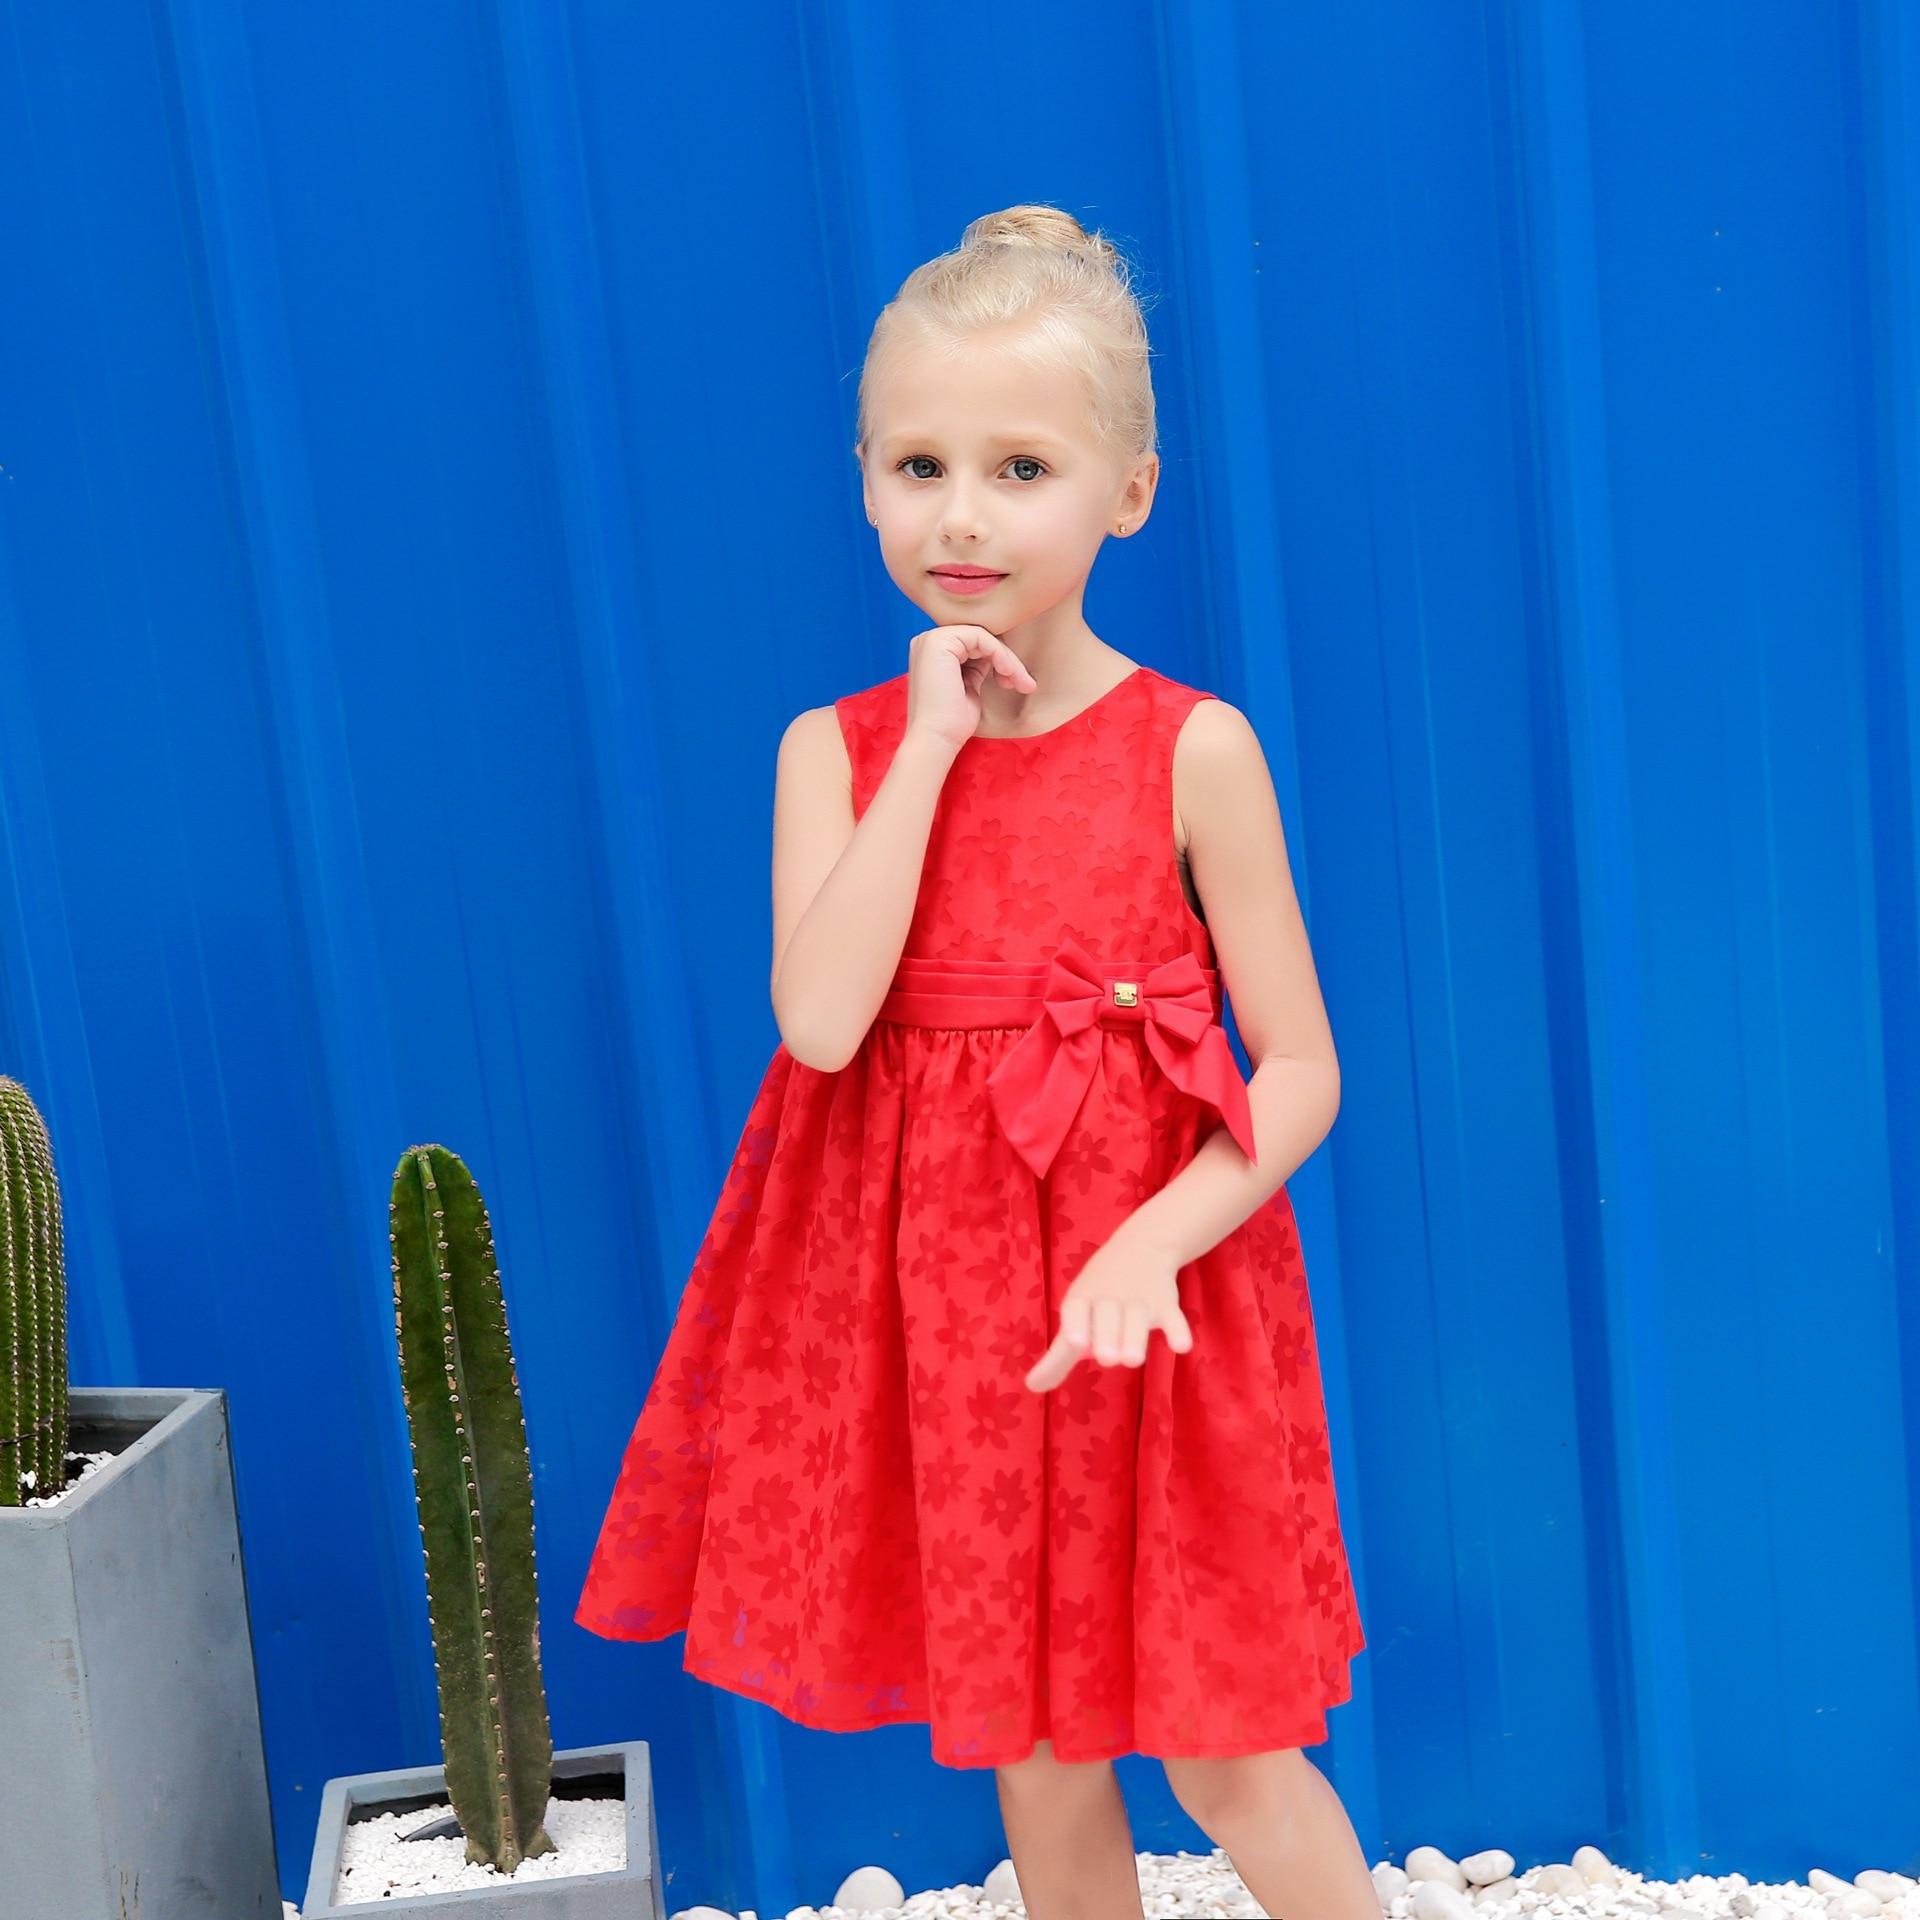 Zomer nieuwe kinderjurk Effen kleur Rood Kindermeisjes Jurken - Kinderkleding - Foto 3